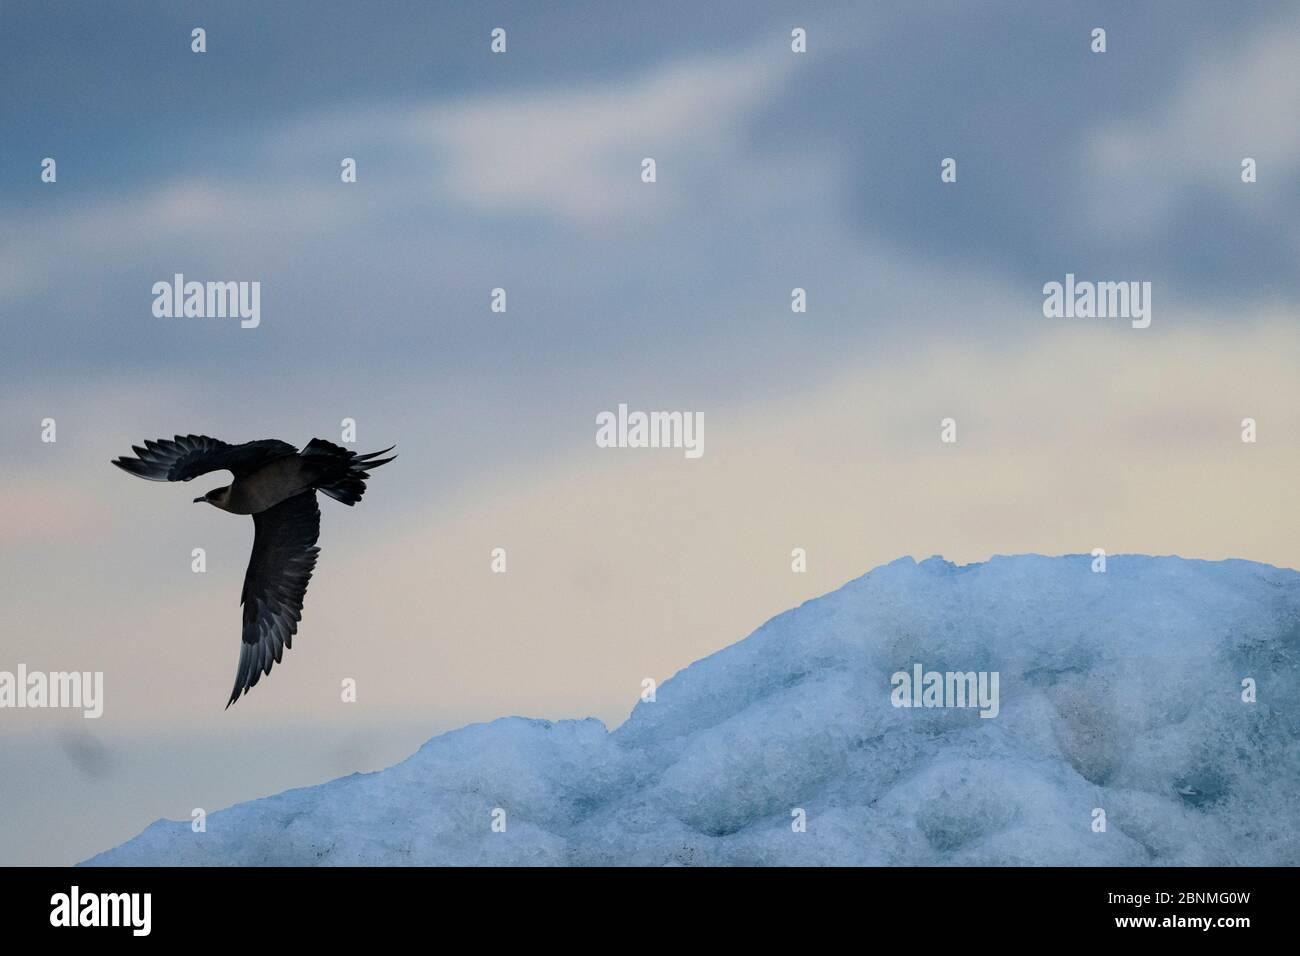 Arktische Skua (Stercorarius parasiticus) im Flug, Island, Juli. Stockfoto